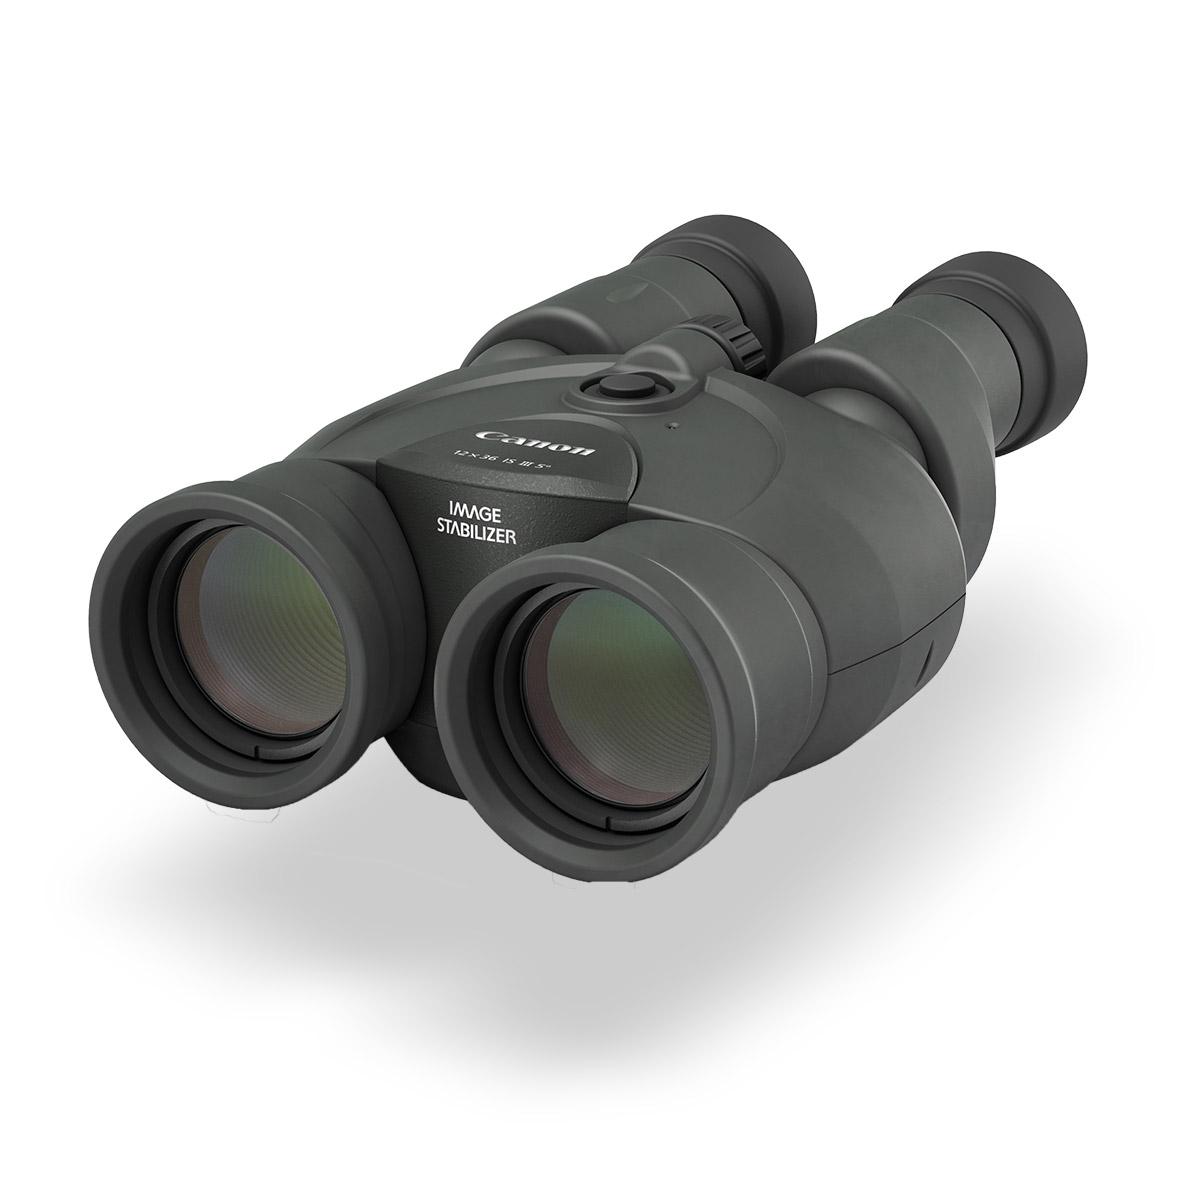 Canon 12 x 36 IS III binoculars